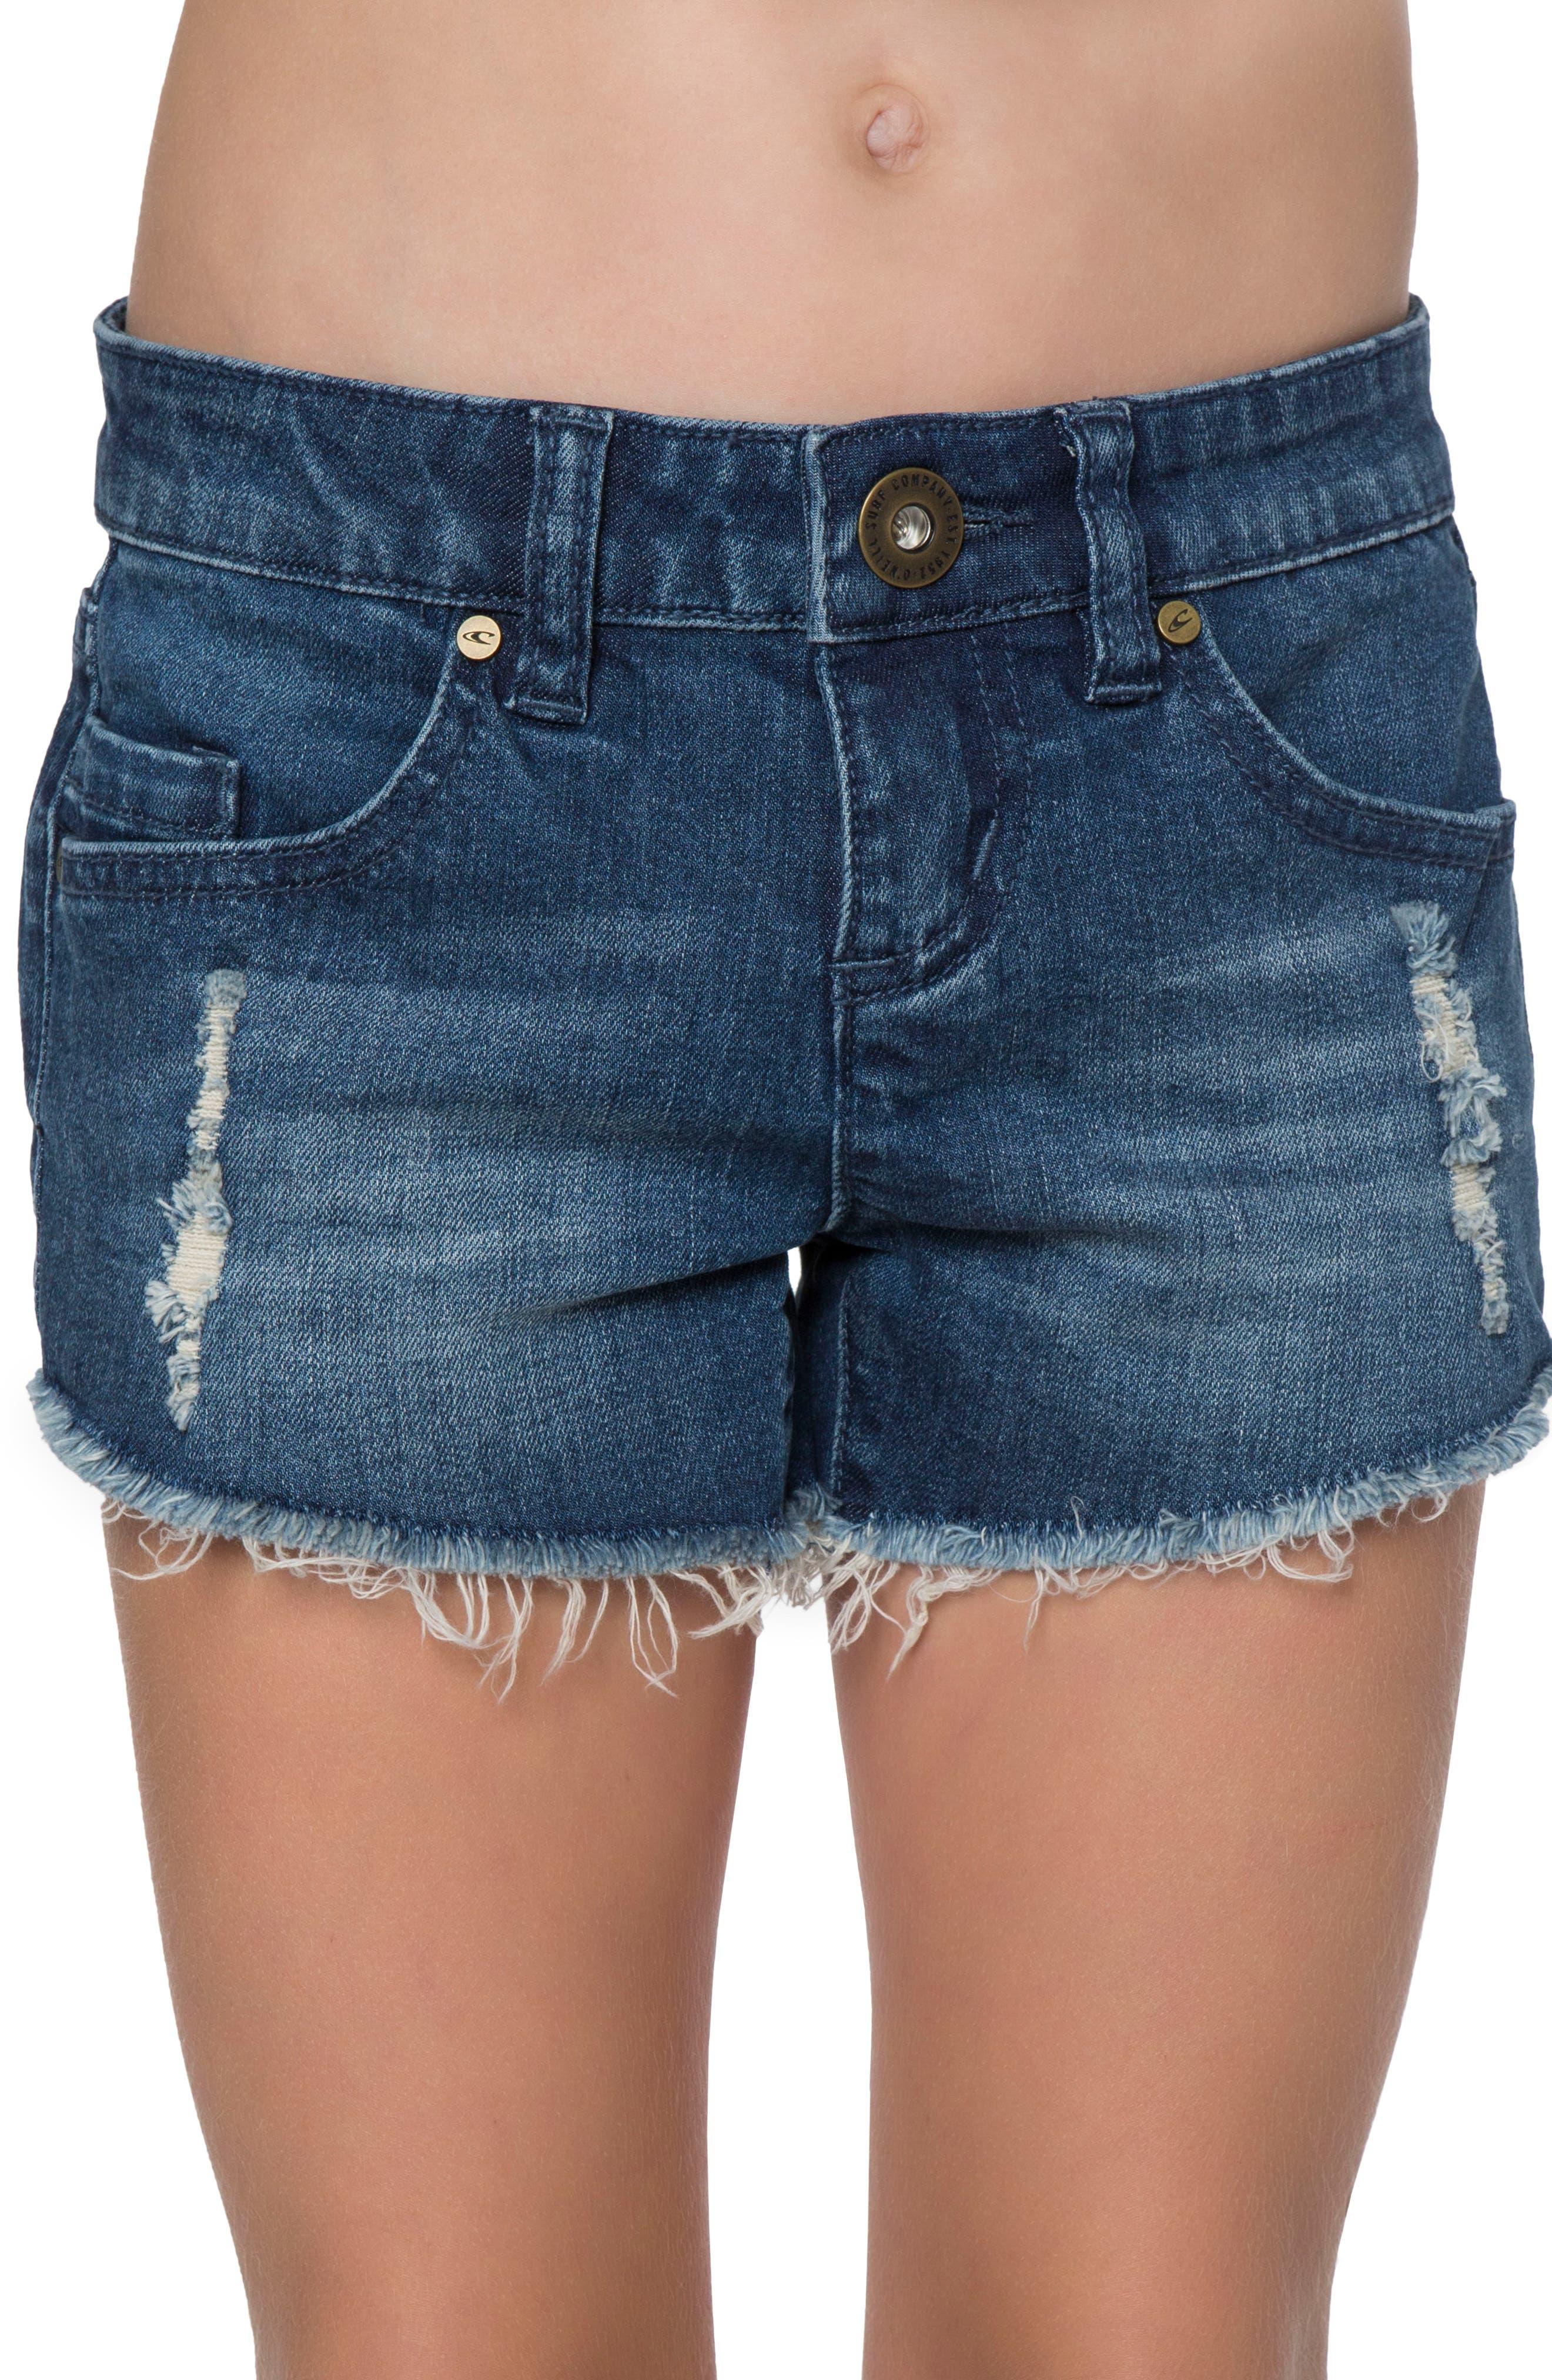 Camper Denim Shorts,                             Main thumbnail 1, color,                             400